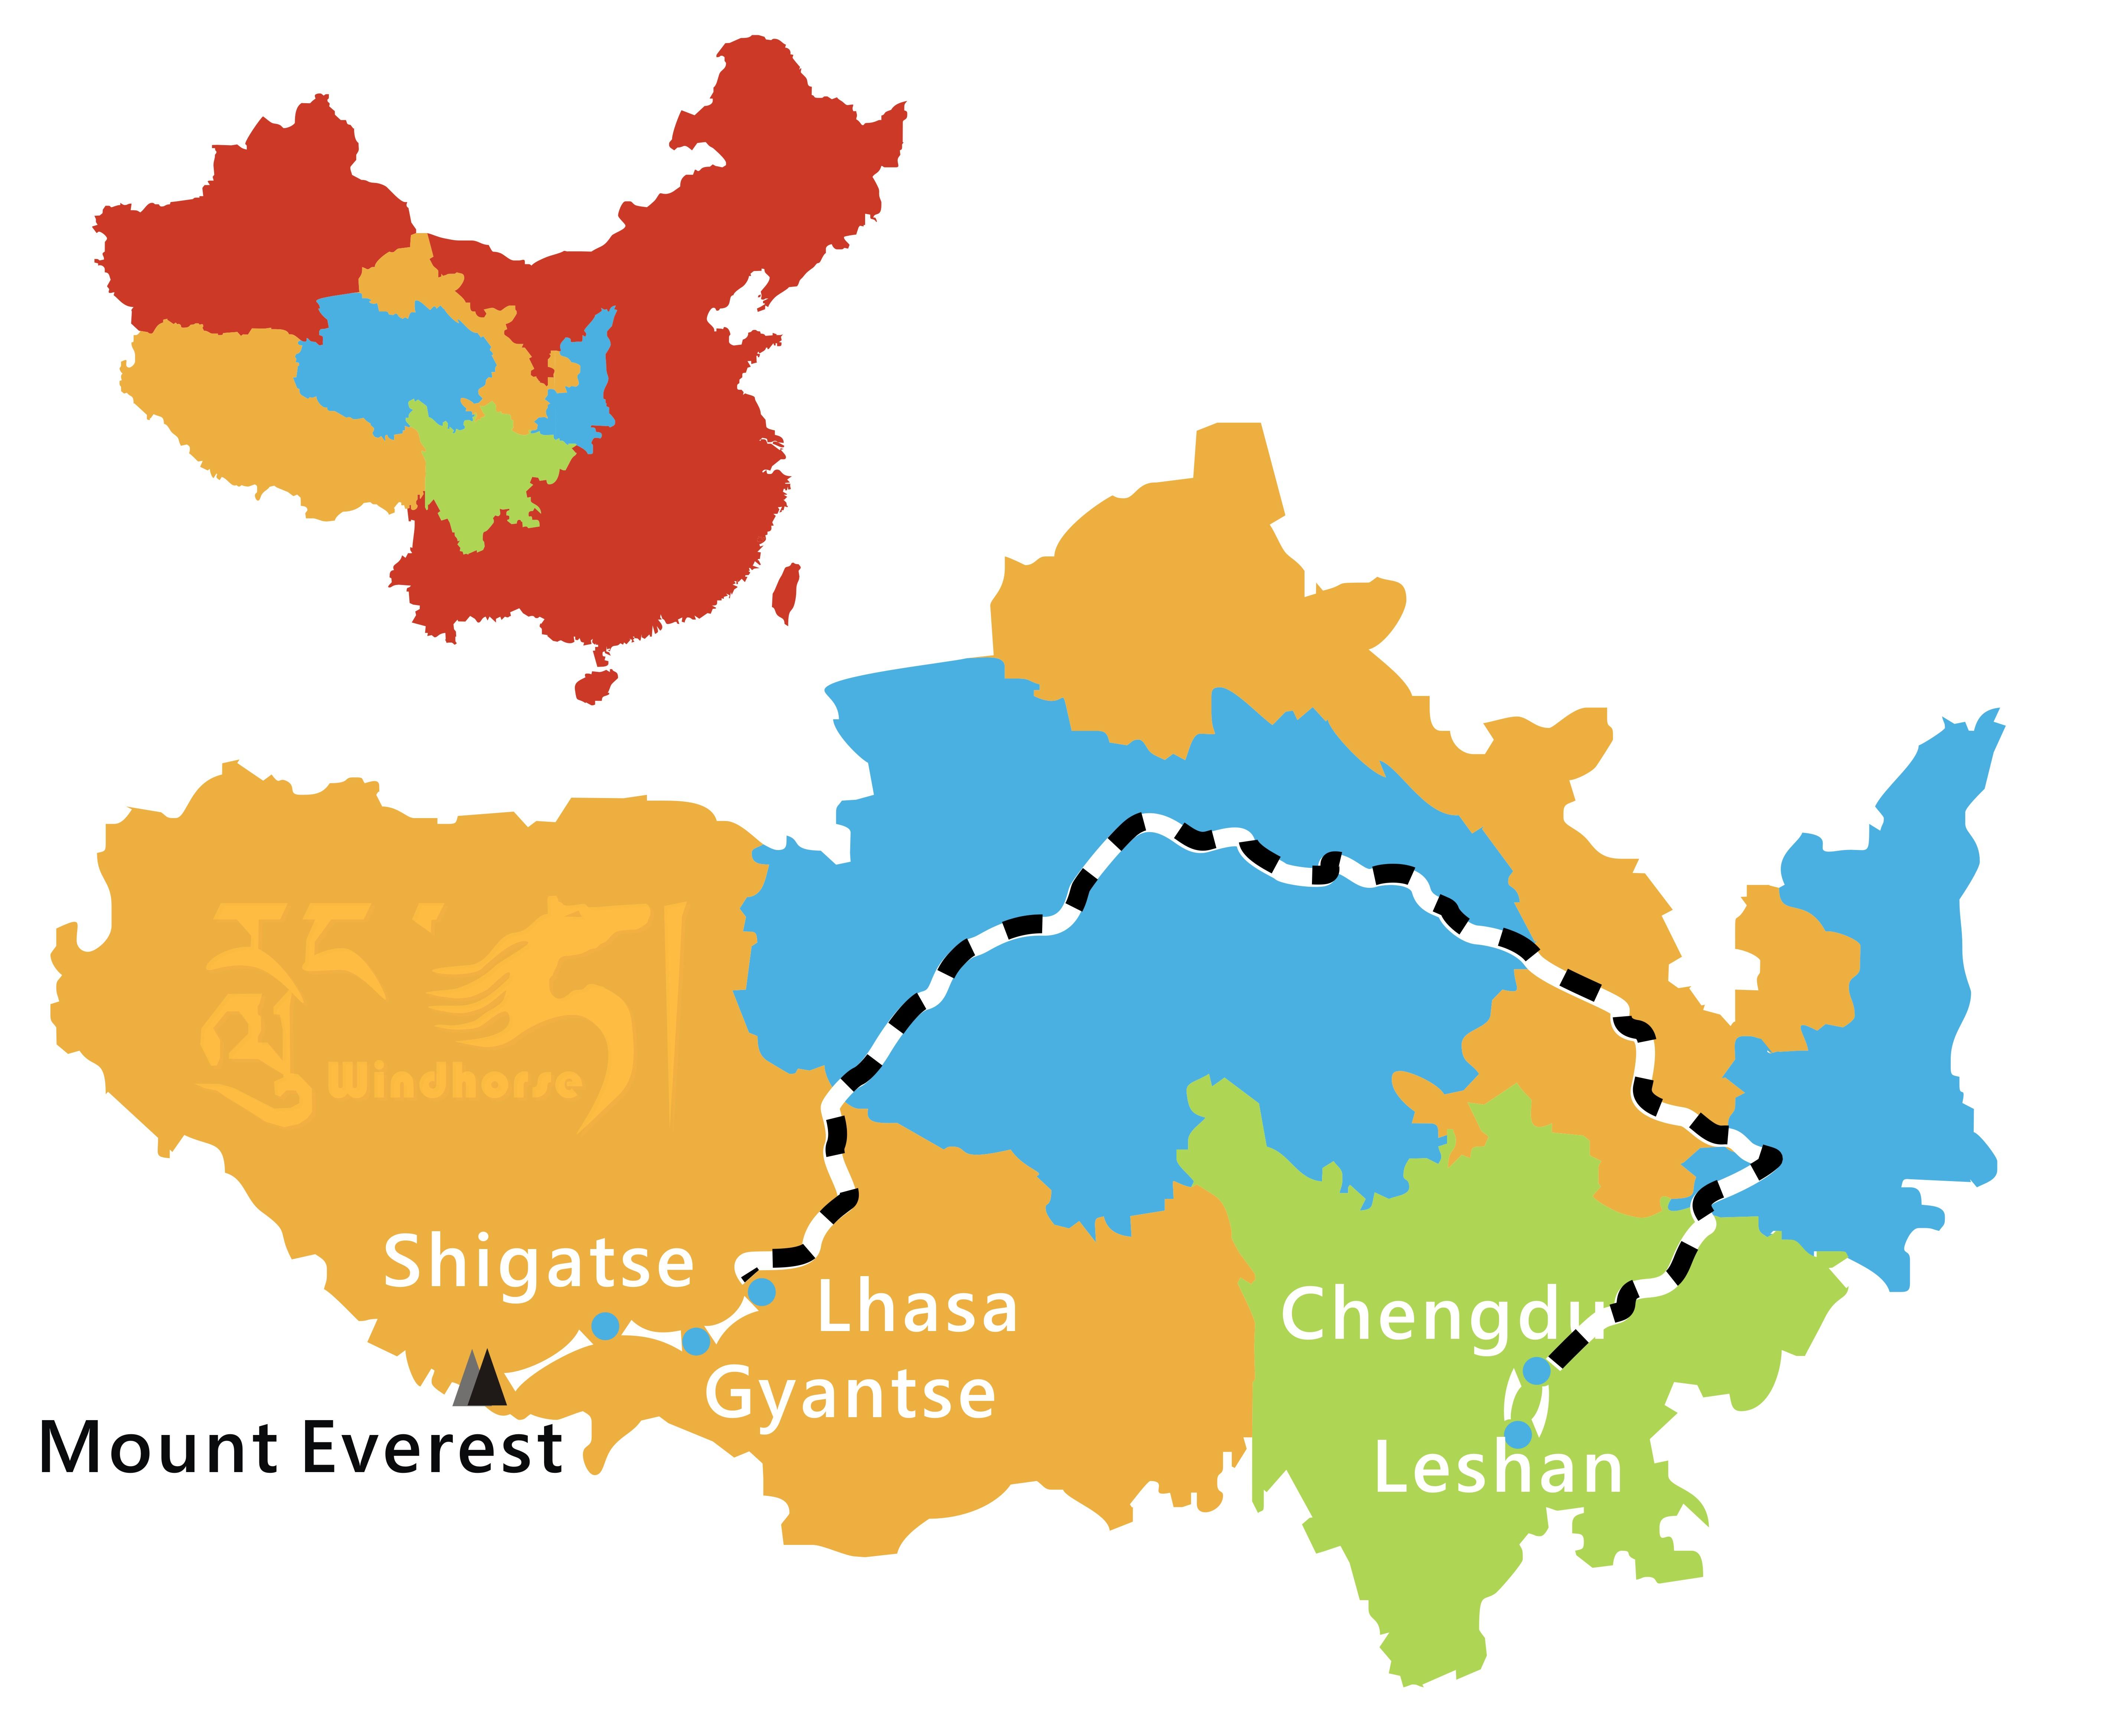 Chengdu Lhasa Train Tour Route